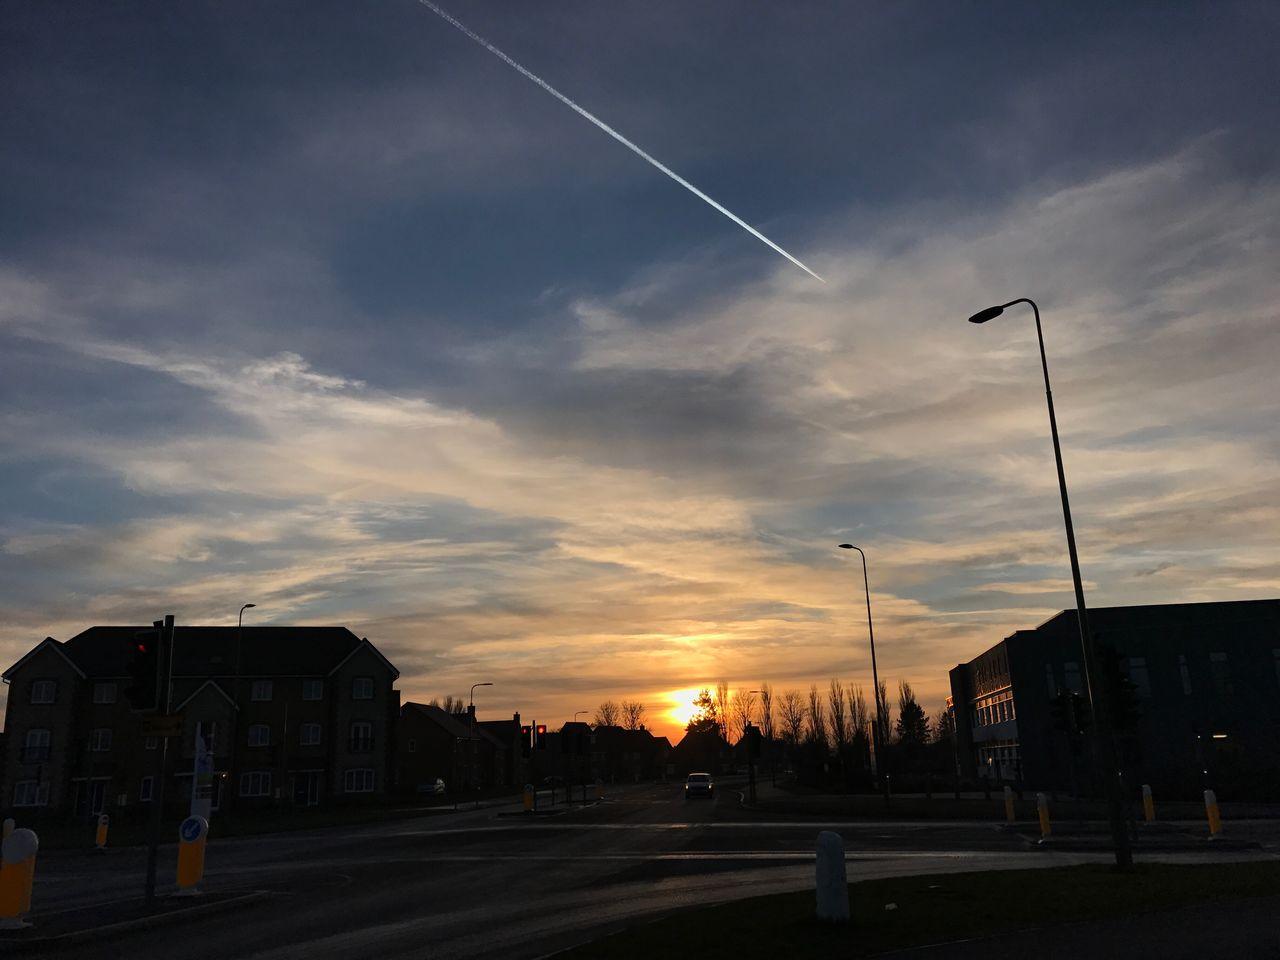 sunset, sky, built structure, street light, building exterior, cloud - sky, outdoors, architecture, vapor trail, no people, road, contrail, nature, city, day